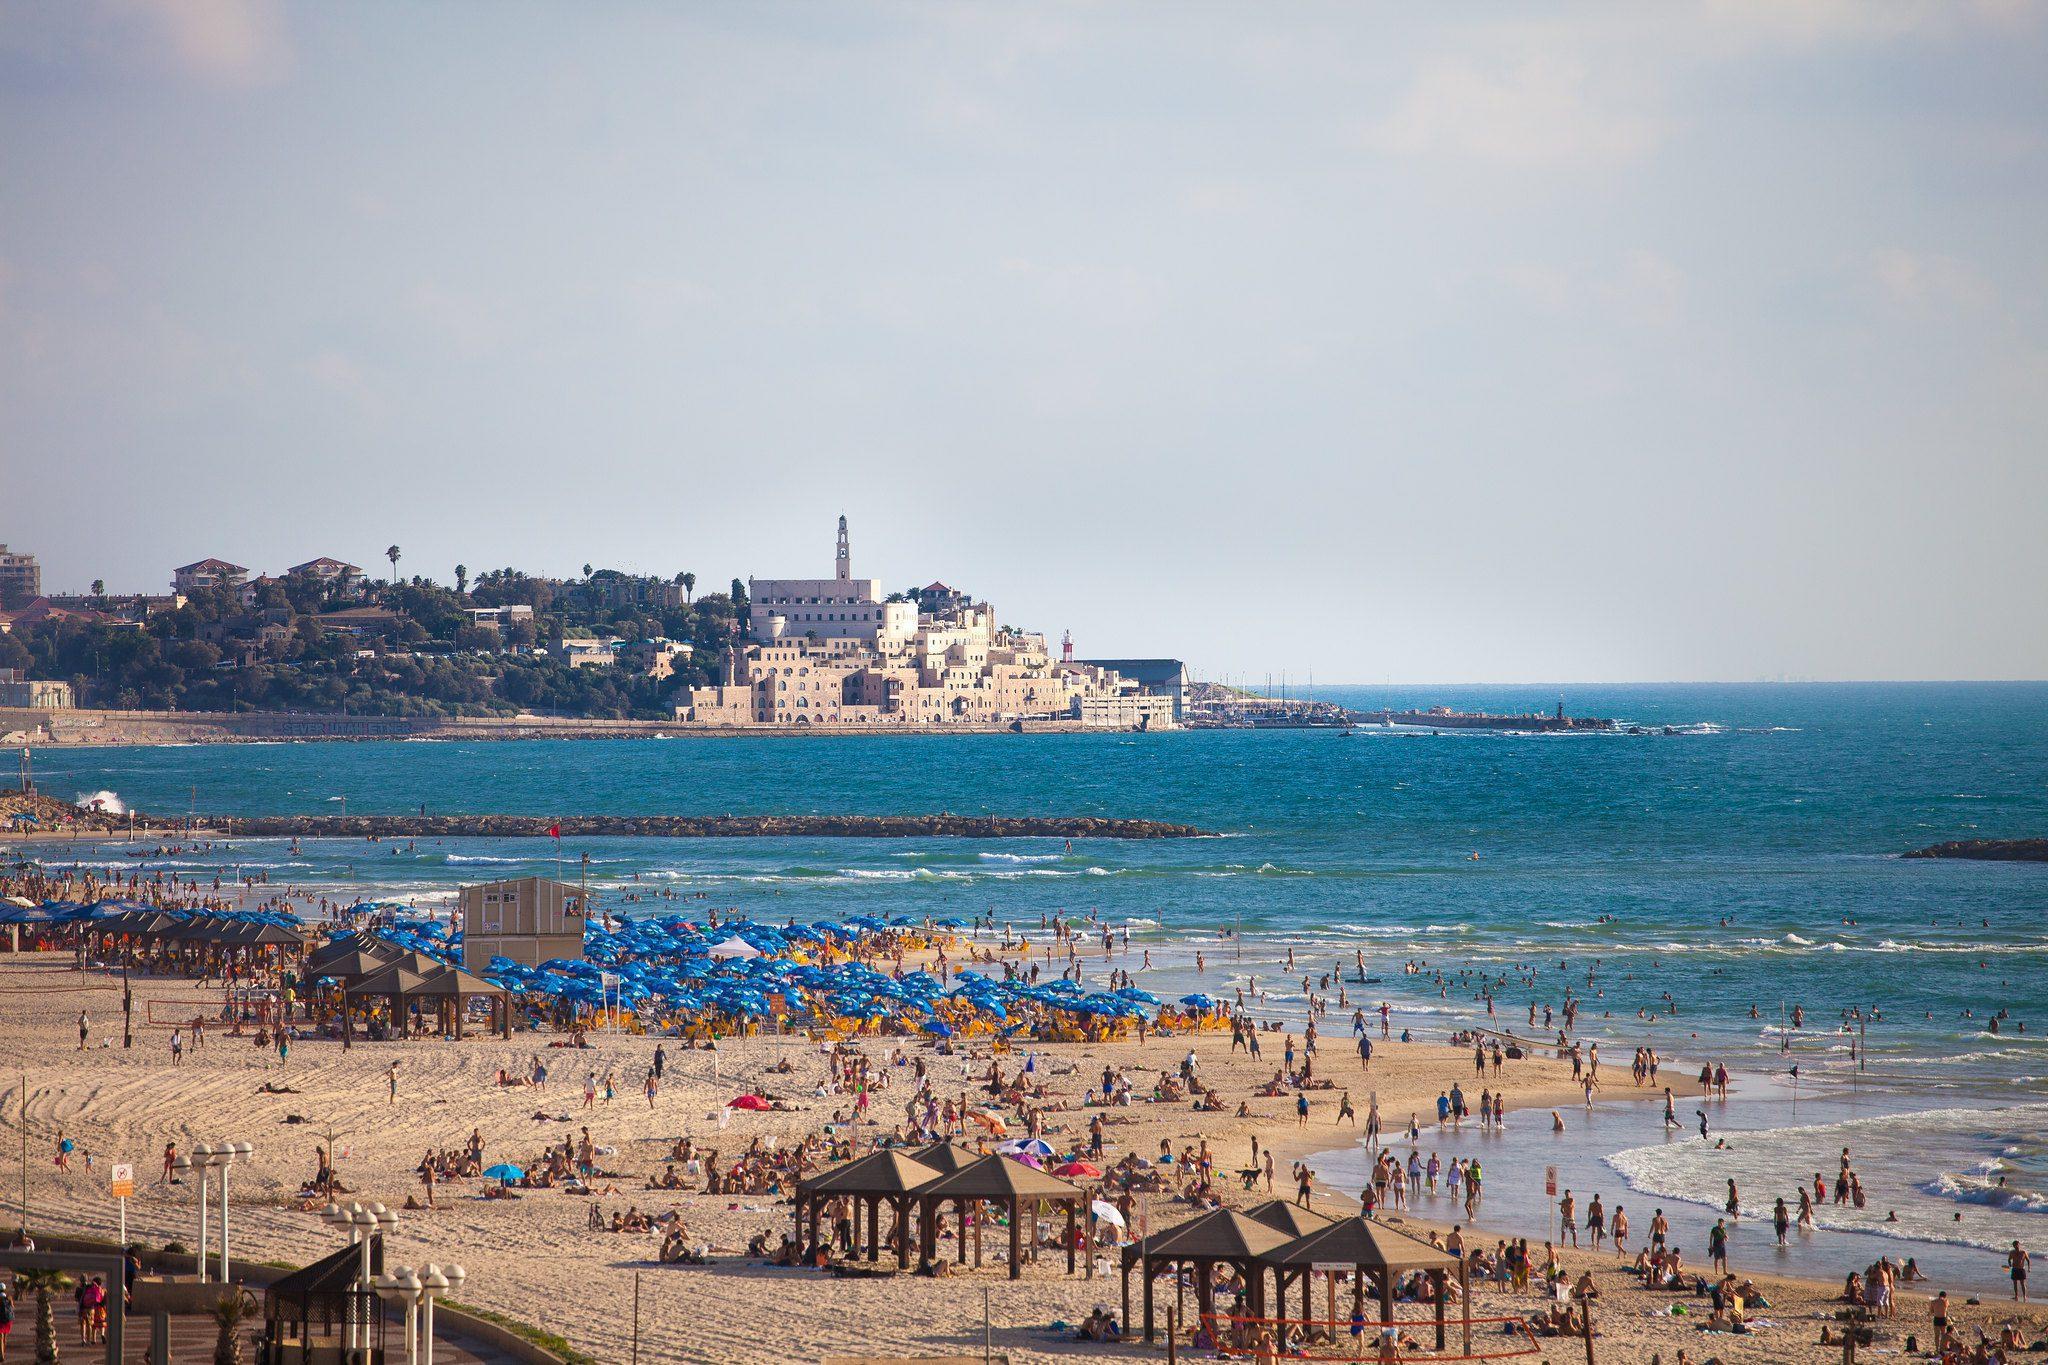 Tel Aviv beach and Jaffa beyond